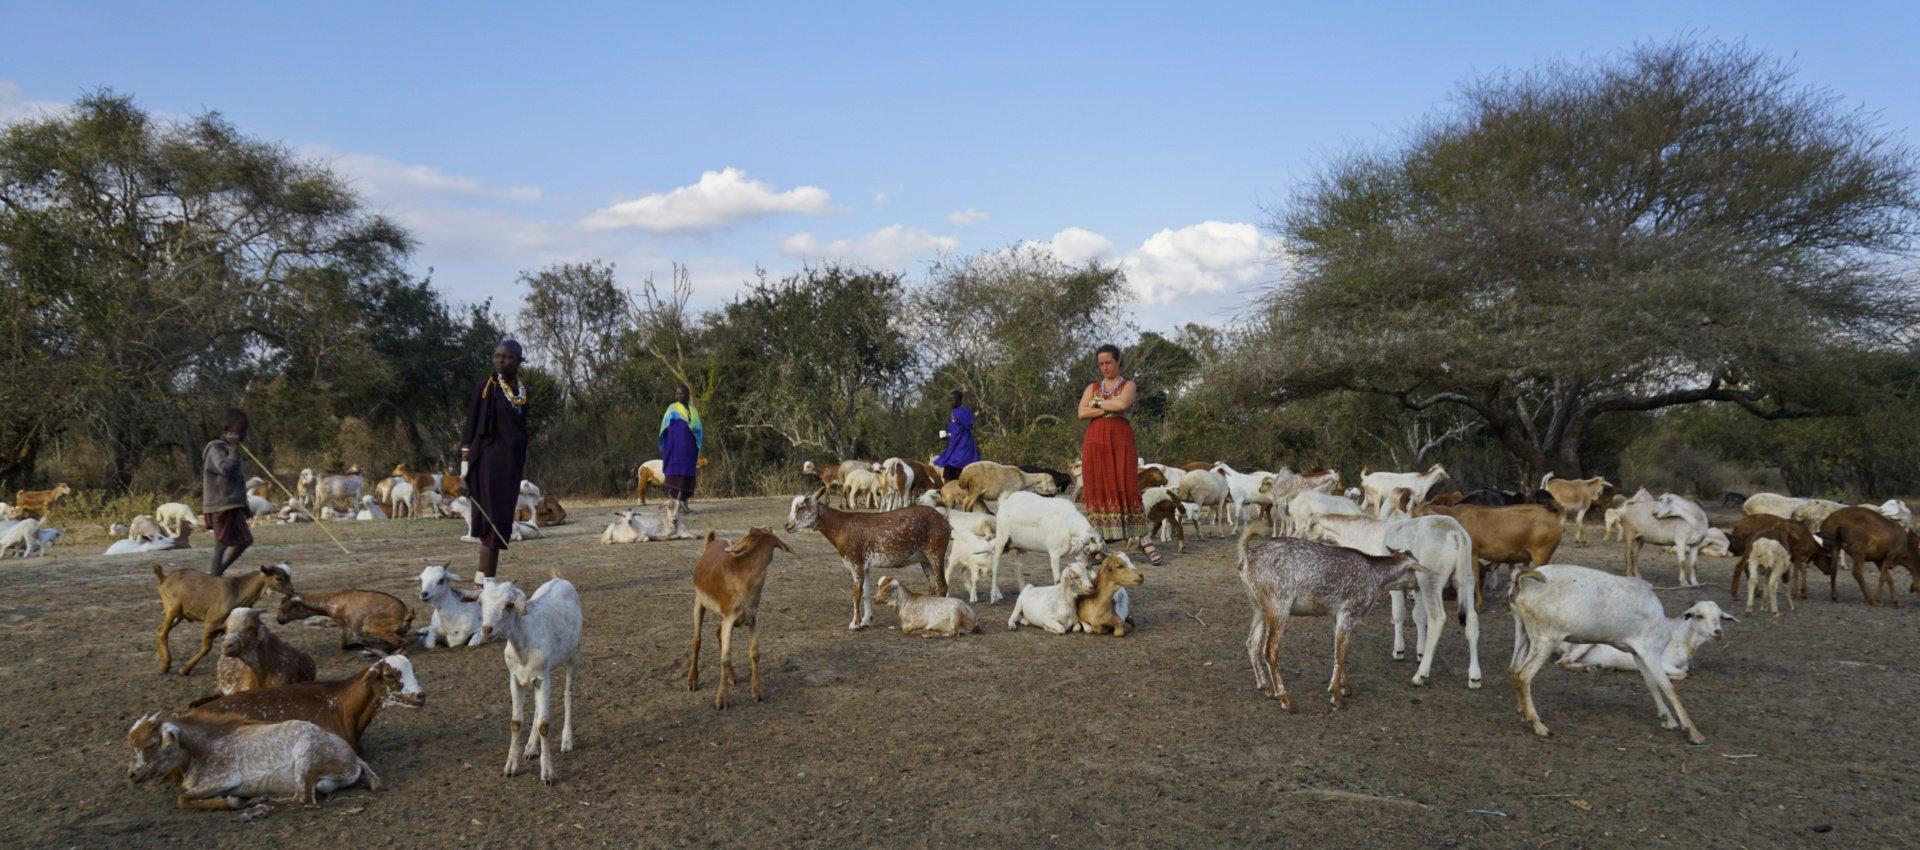 The goats return to the Masai boma, Tanzania - Experiencing The Globe